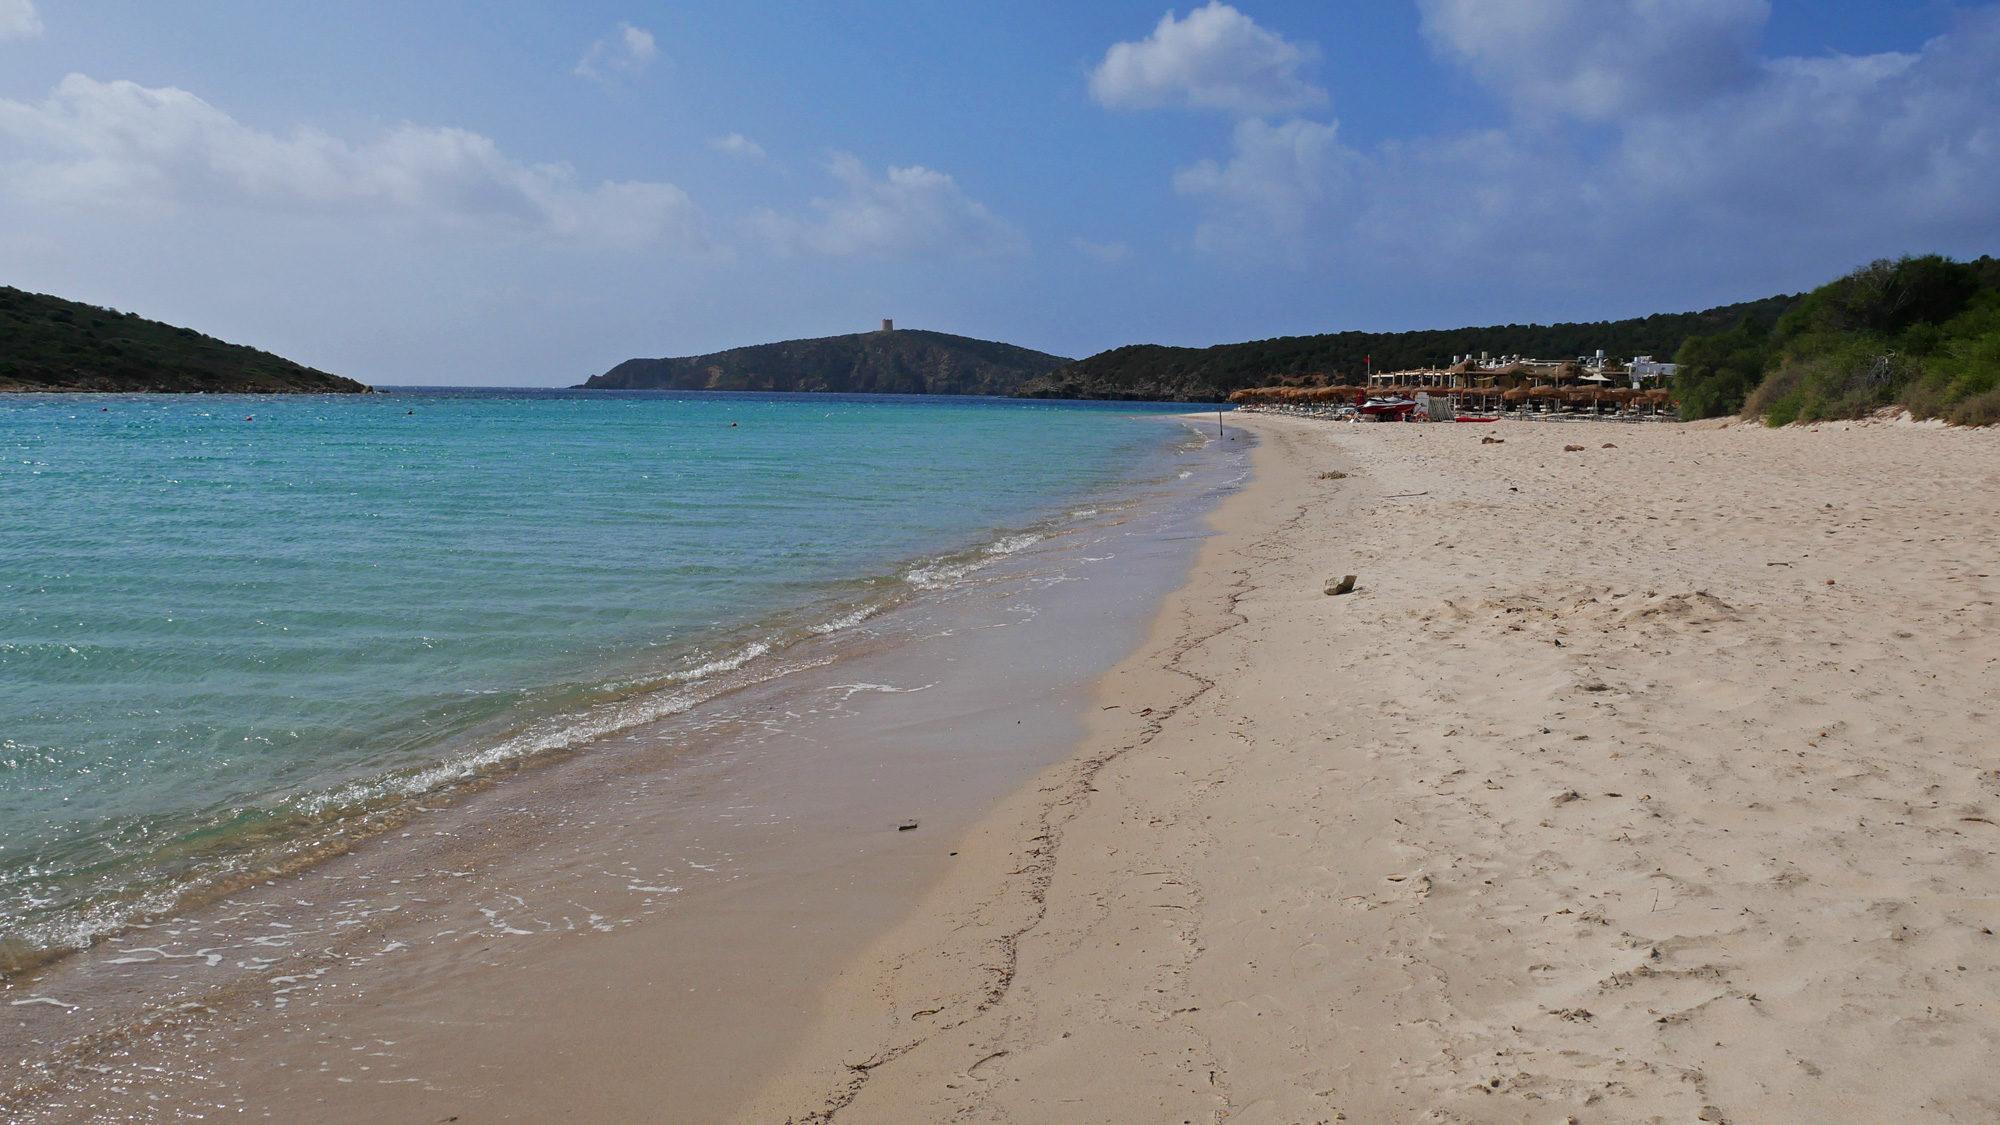 Strand von Tuerredda mit Strandbar